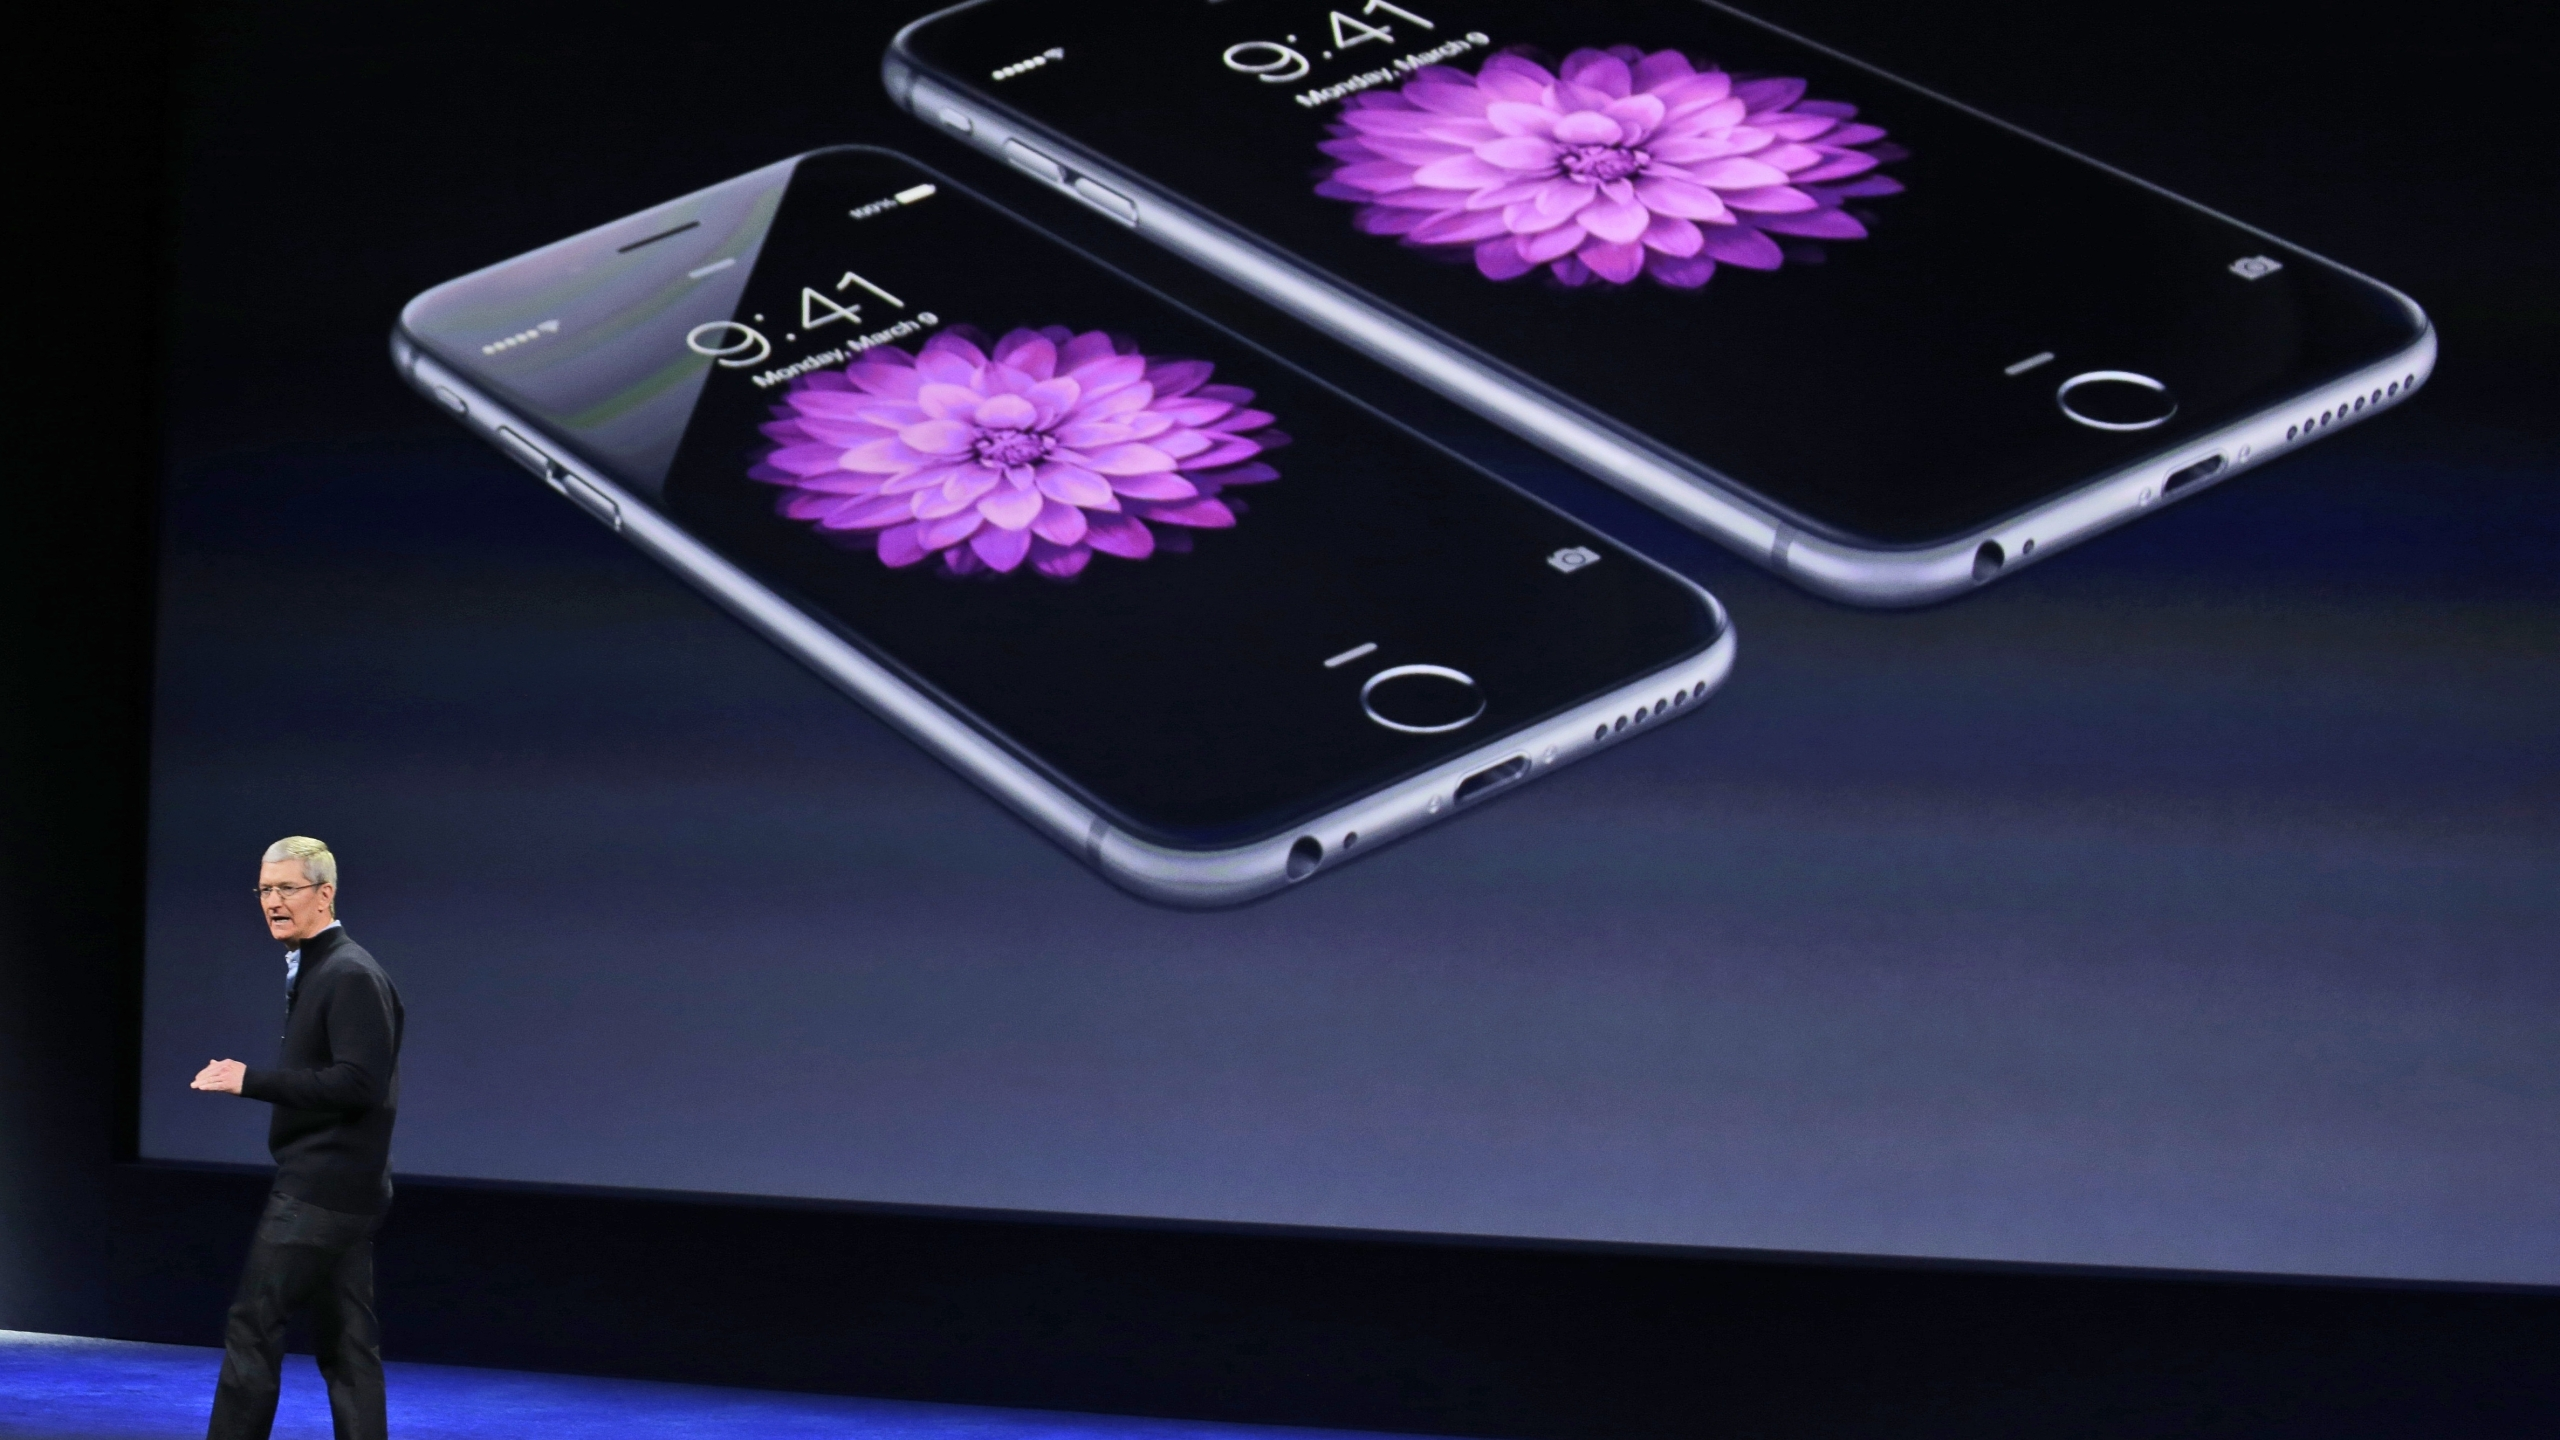 iPhone_Lawsuit_78721-159532.jpg29733059